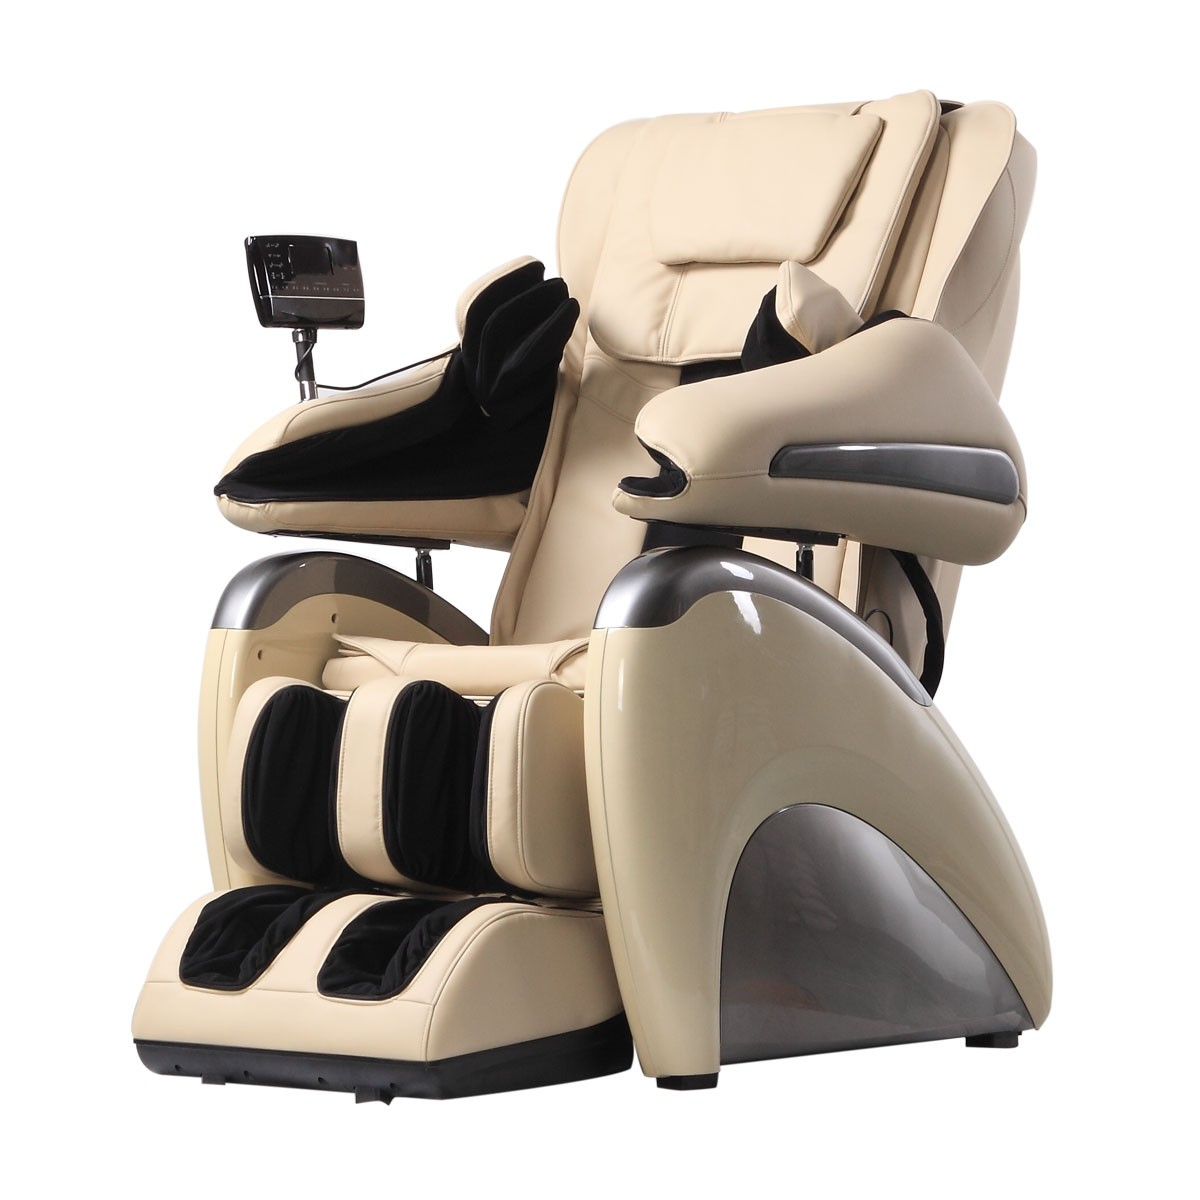 zero gravity heated reclining s track massage chair a05 1c